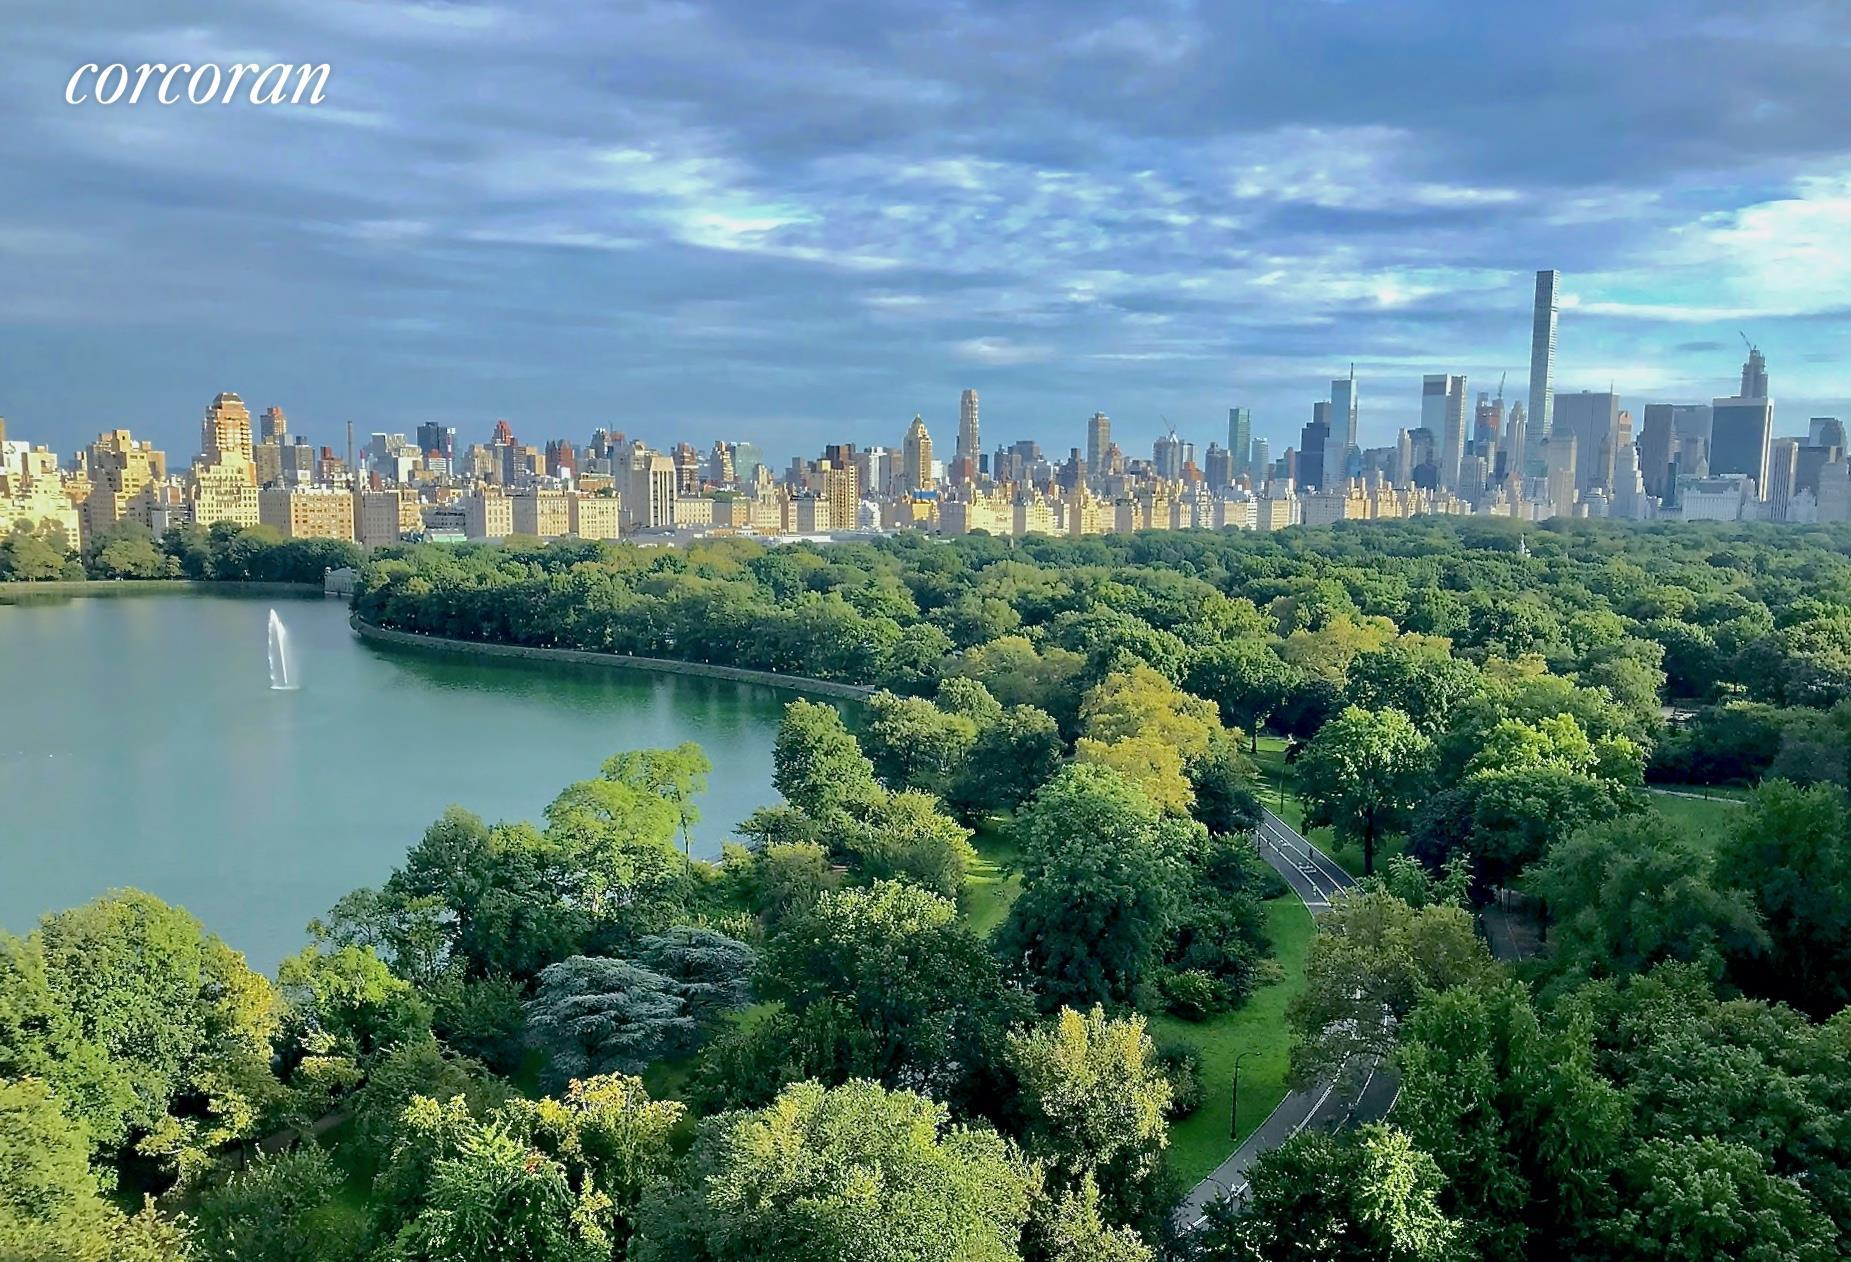 300 Central Park West New York, NY 10024